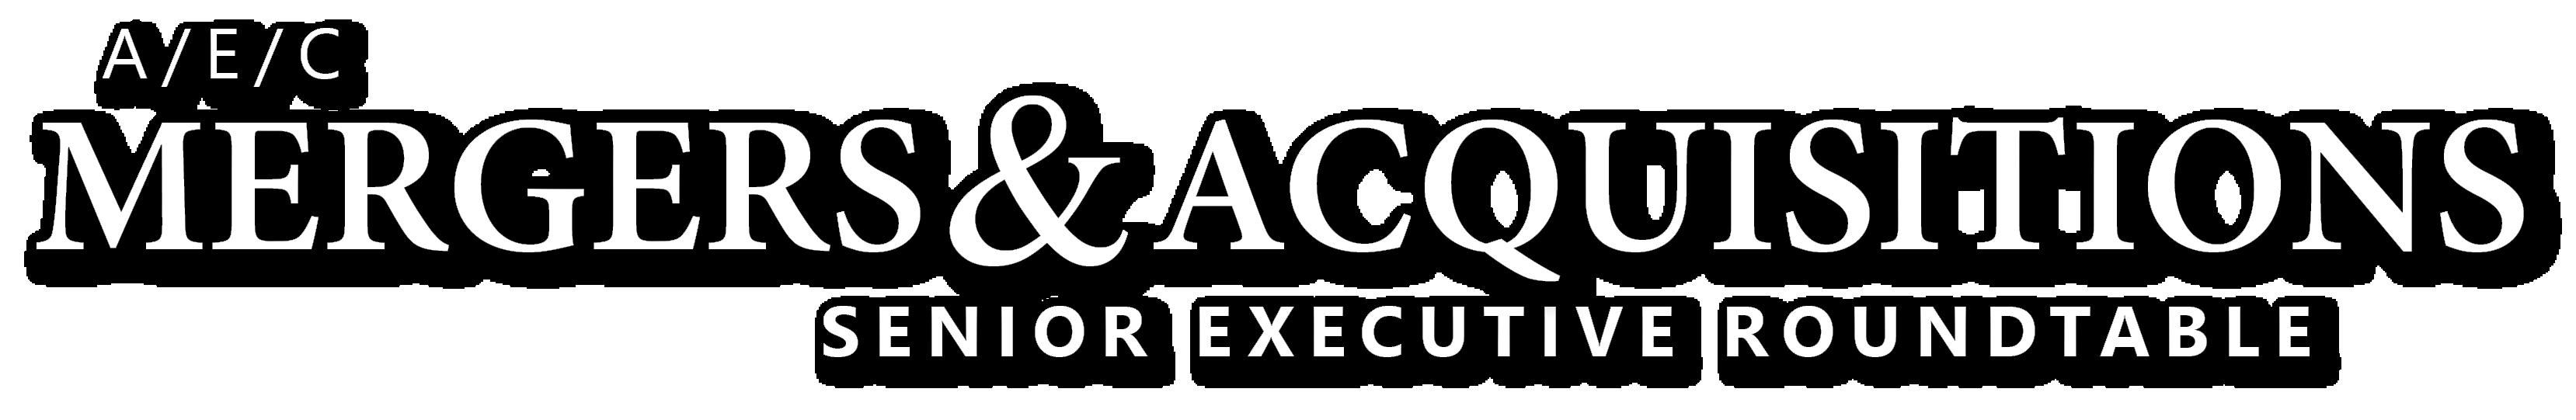 A/E/C Mergers & Acquisitions Roundtable